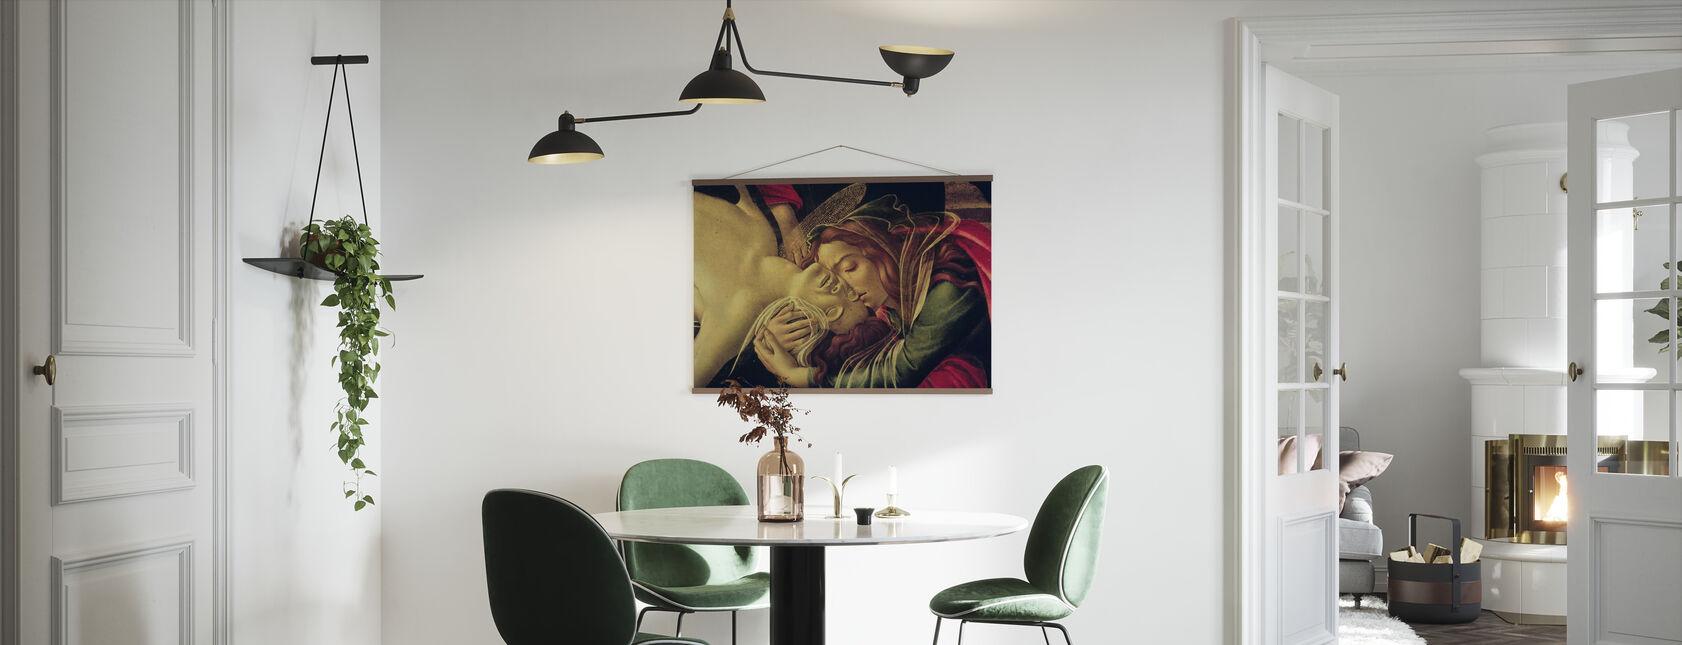 Lamentation of Christ - Sandro Botticelli - Poster - Kitchen